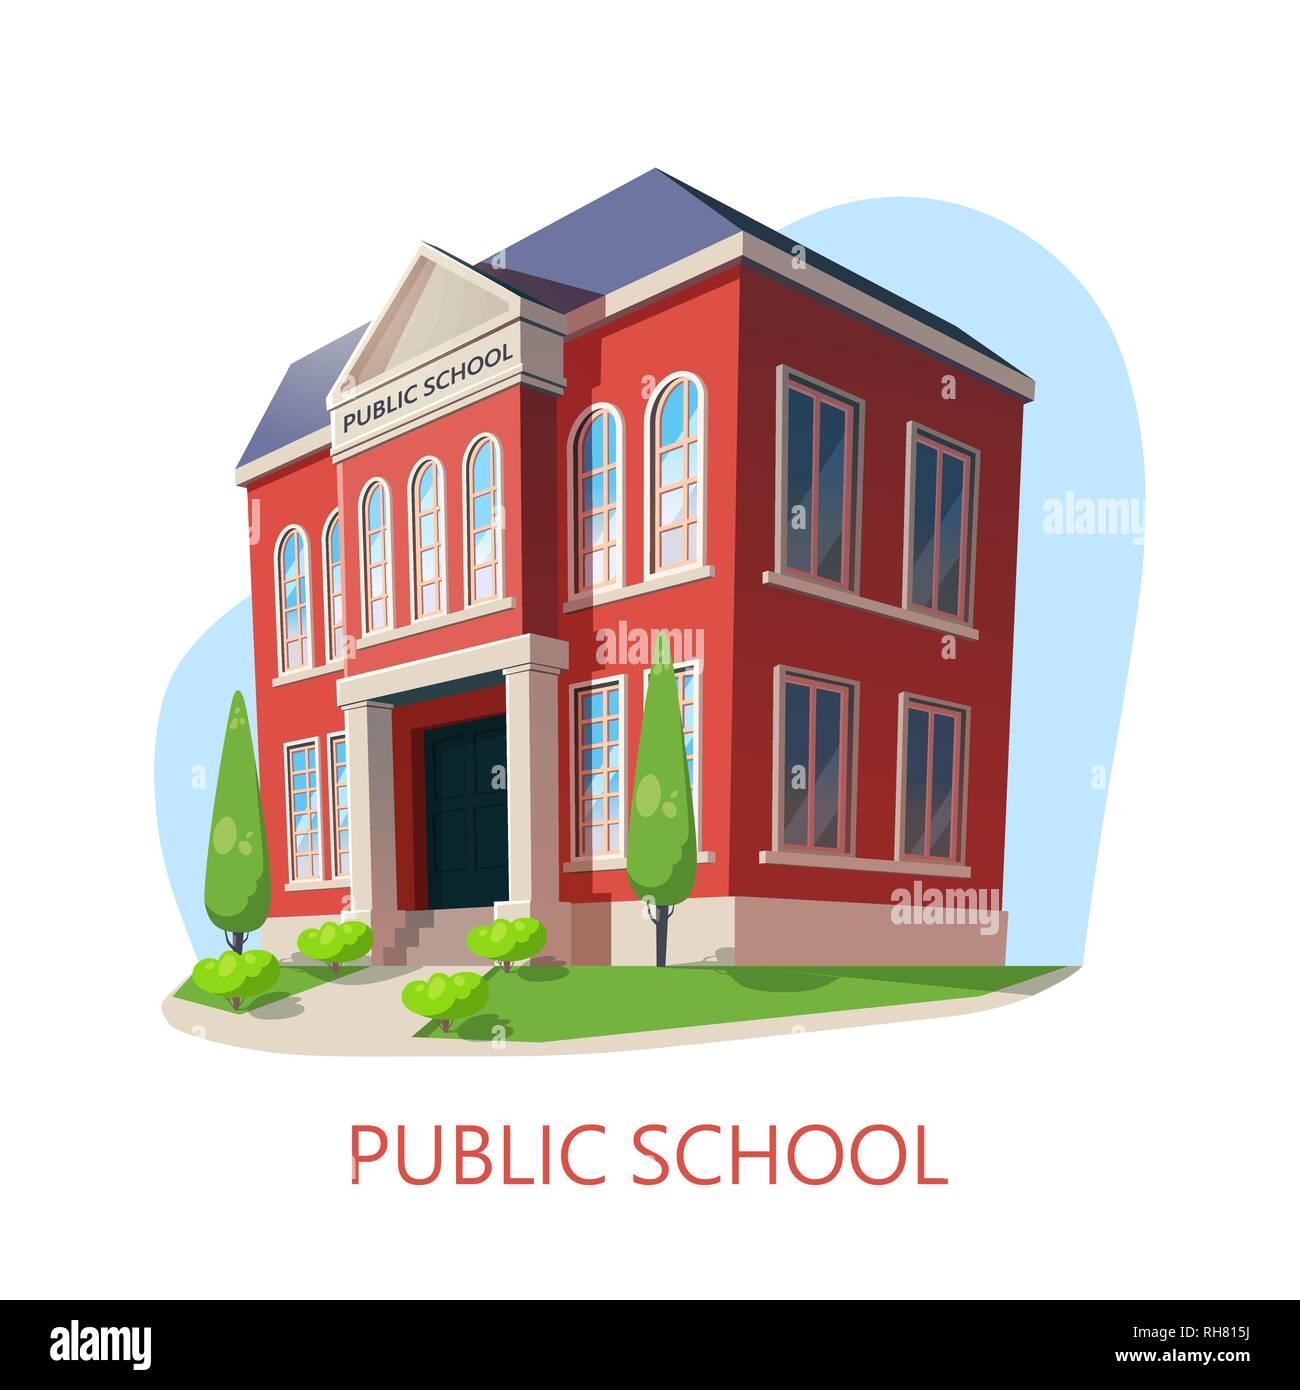 Public school. Elementary education building - Stock Image